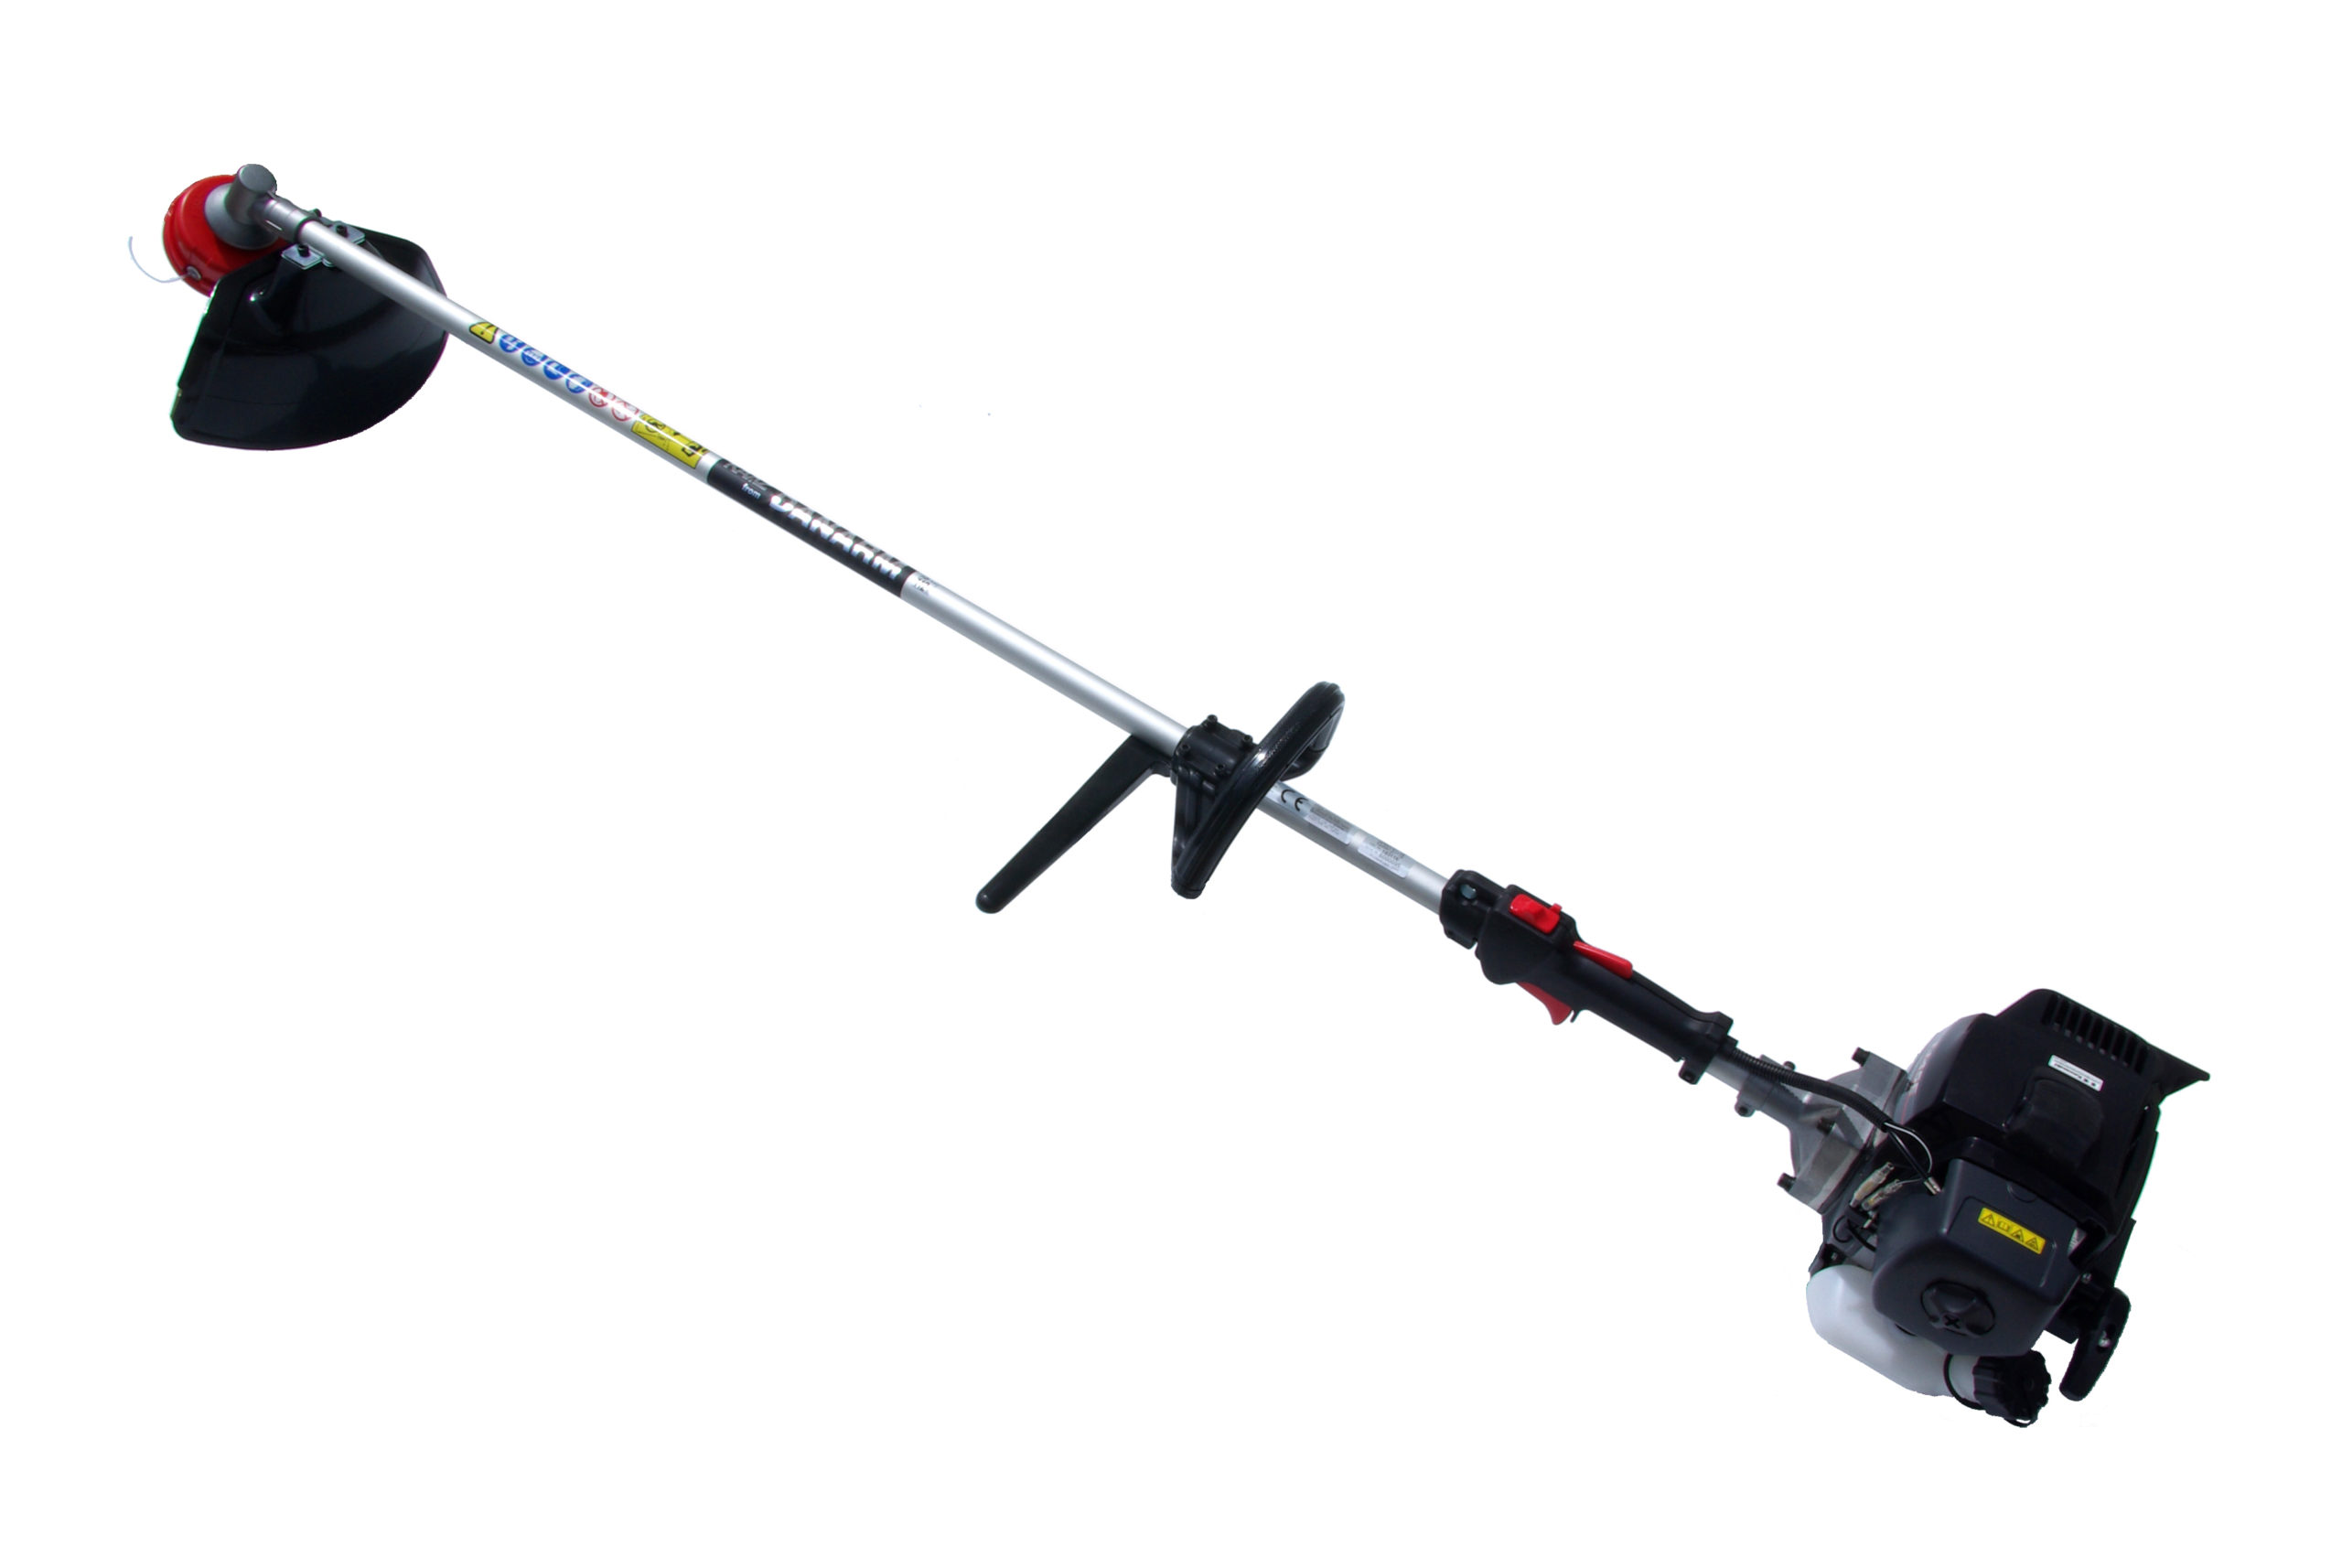 Danarm professional loop handle Brush cutter